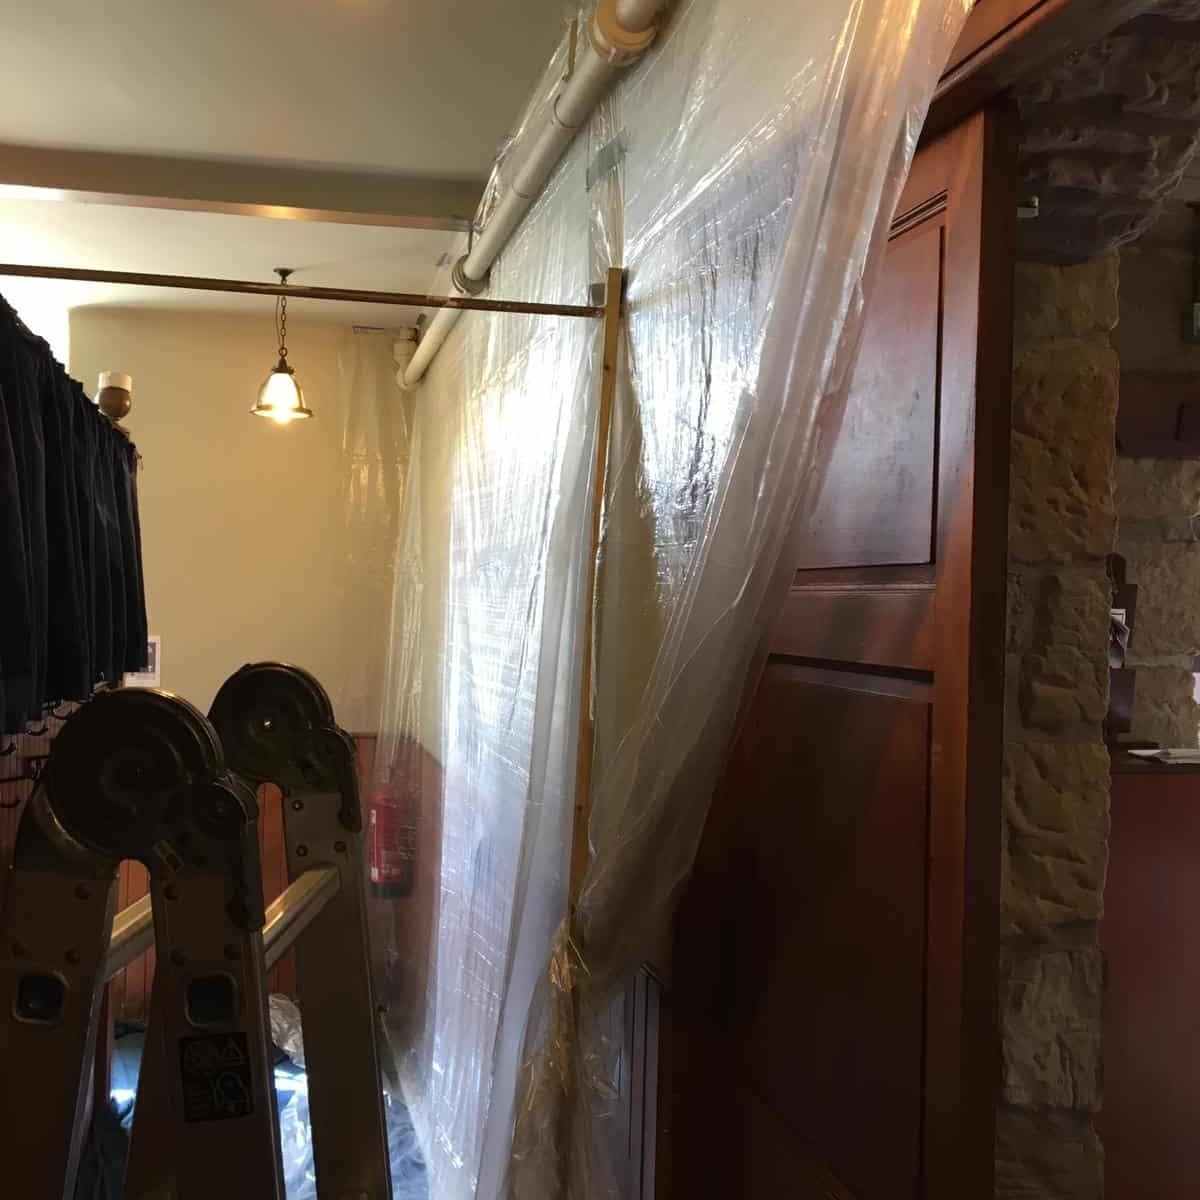 Photos from Bishopton Parish Church heating system 17